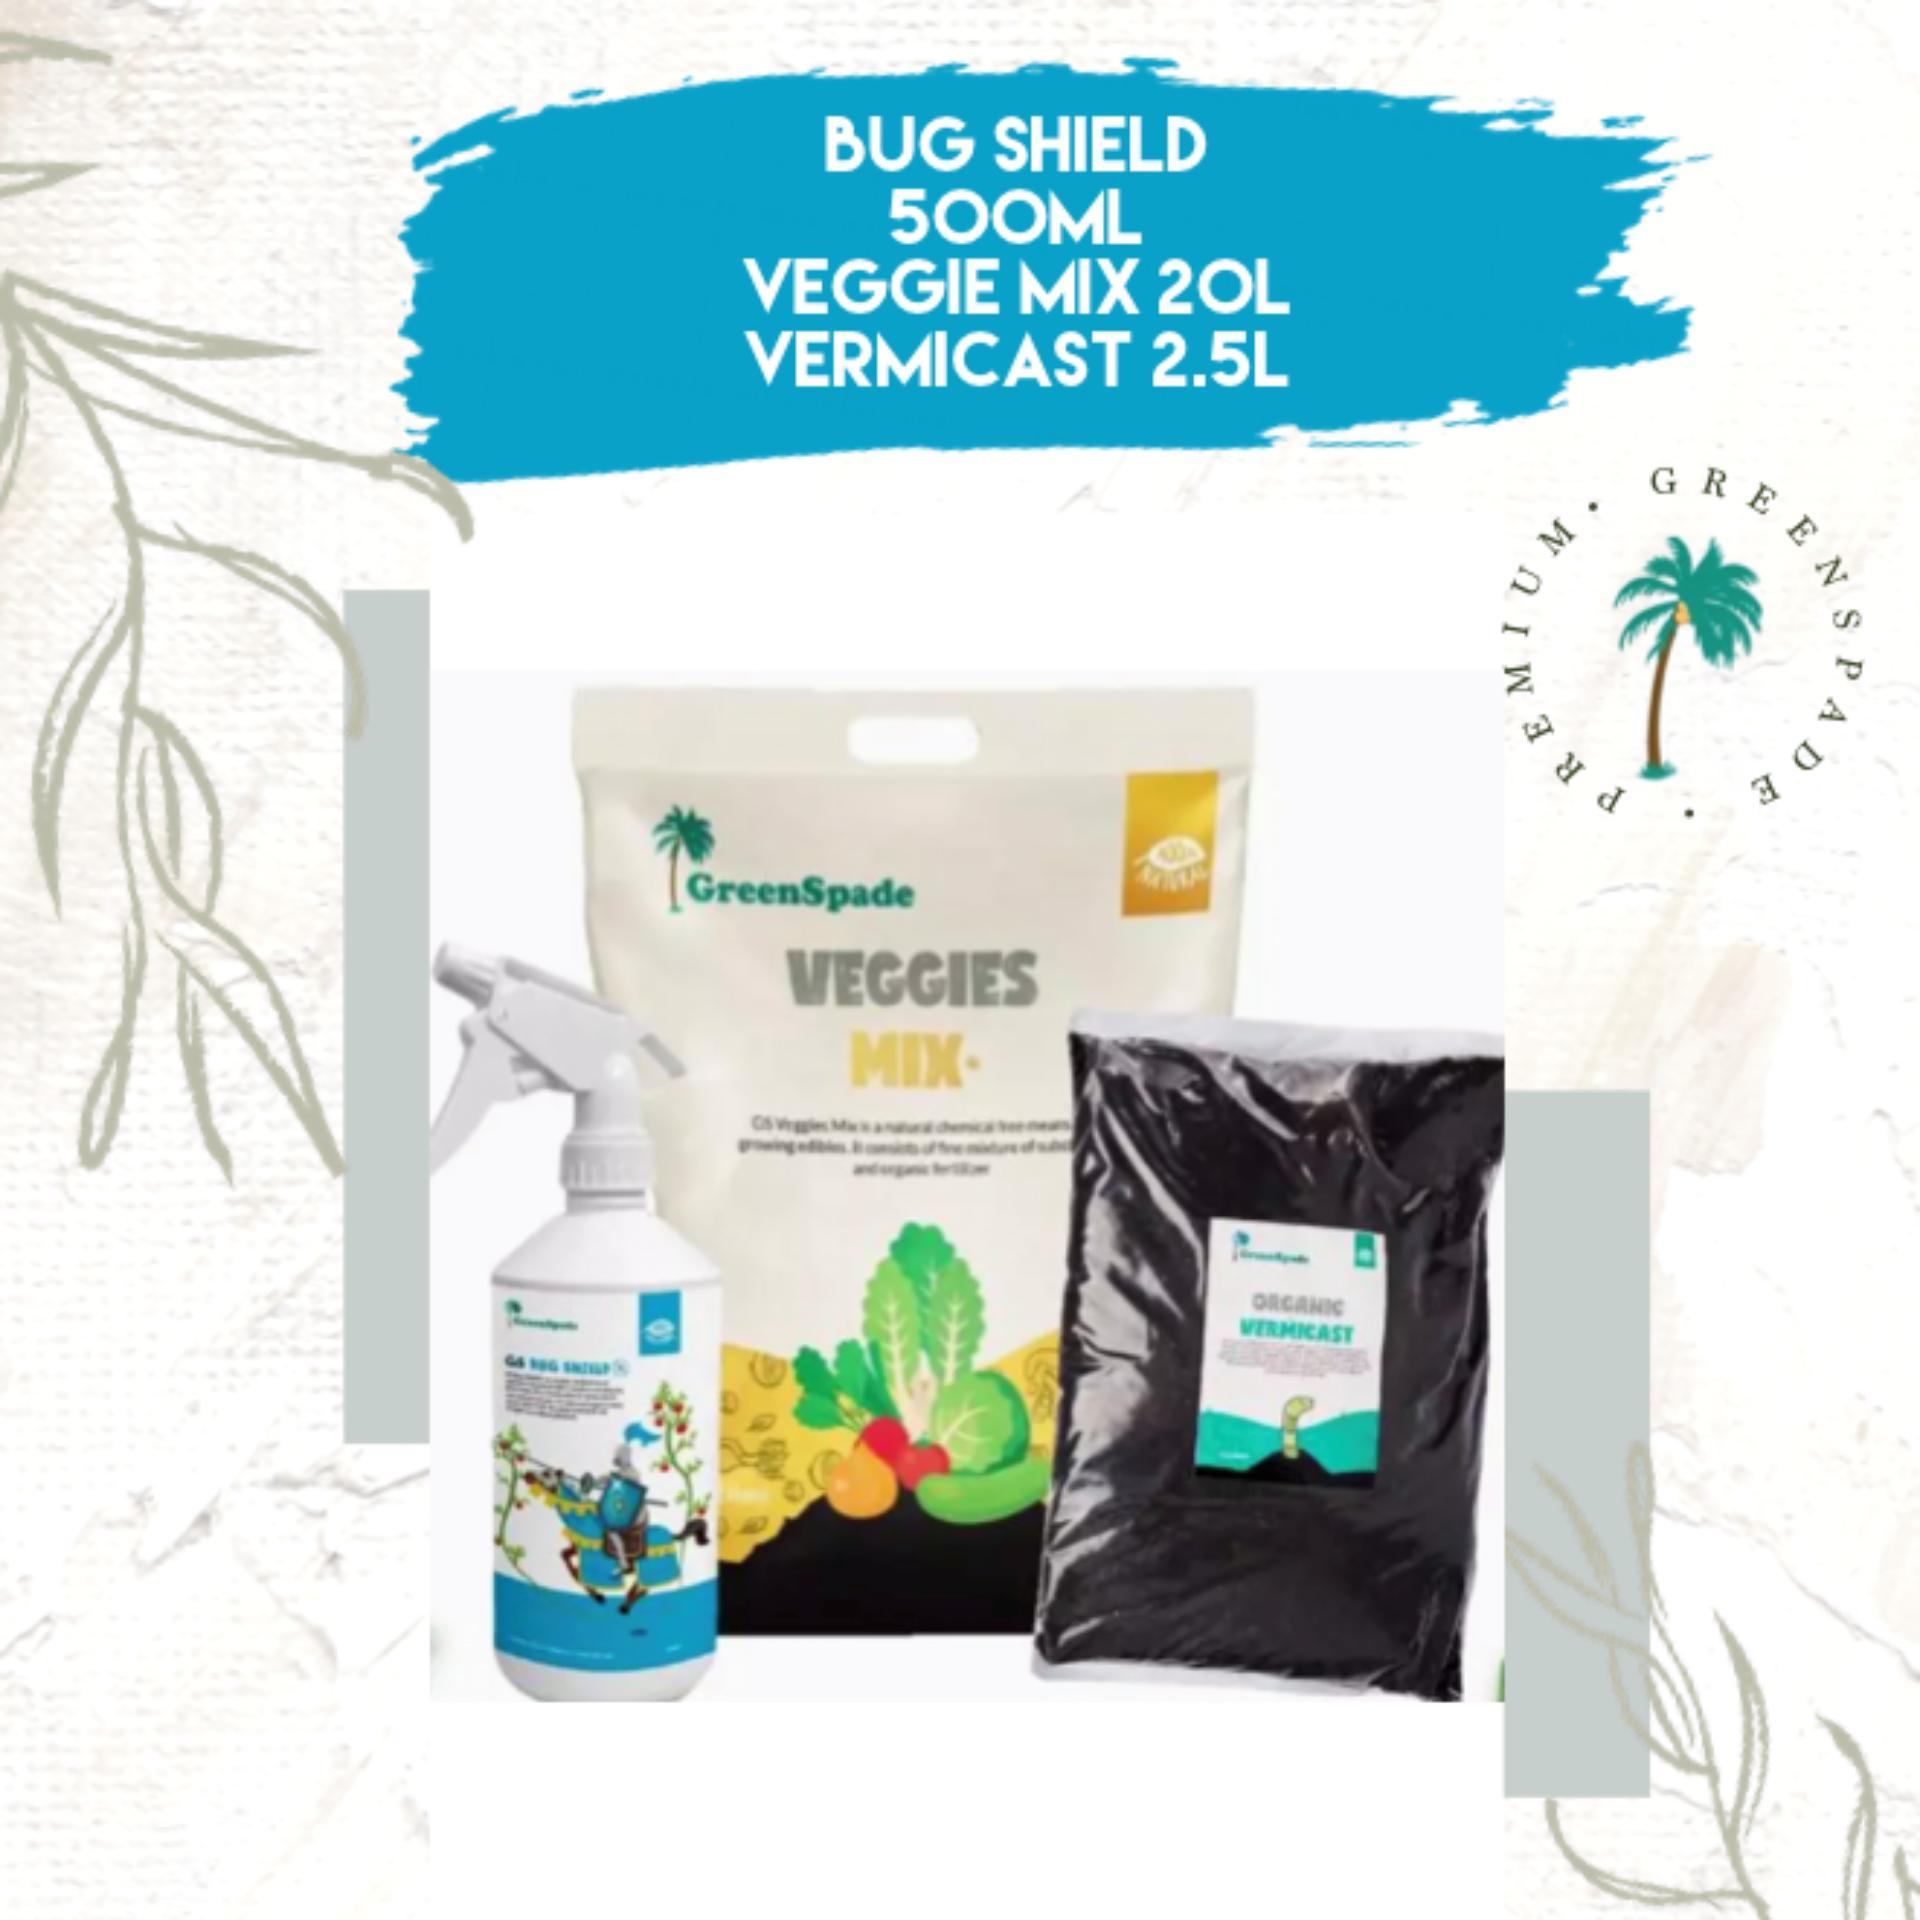 [BUNDLE] Green Spade Veggies Mix 20L, Bug Shield 500ml, Vermicast 2.5L